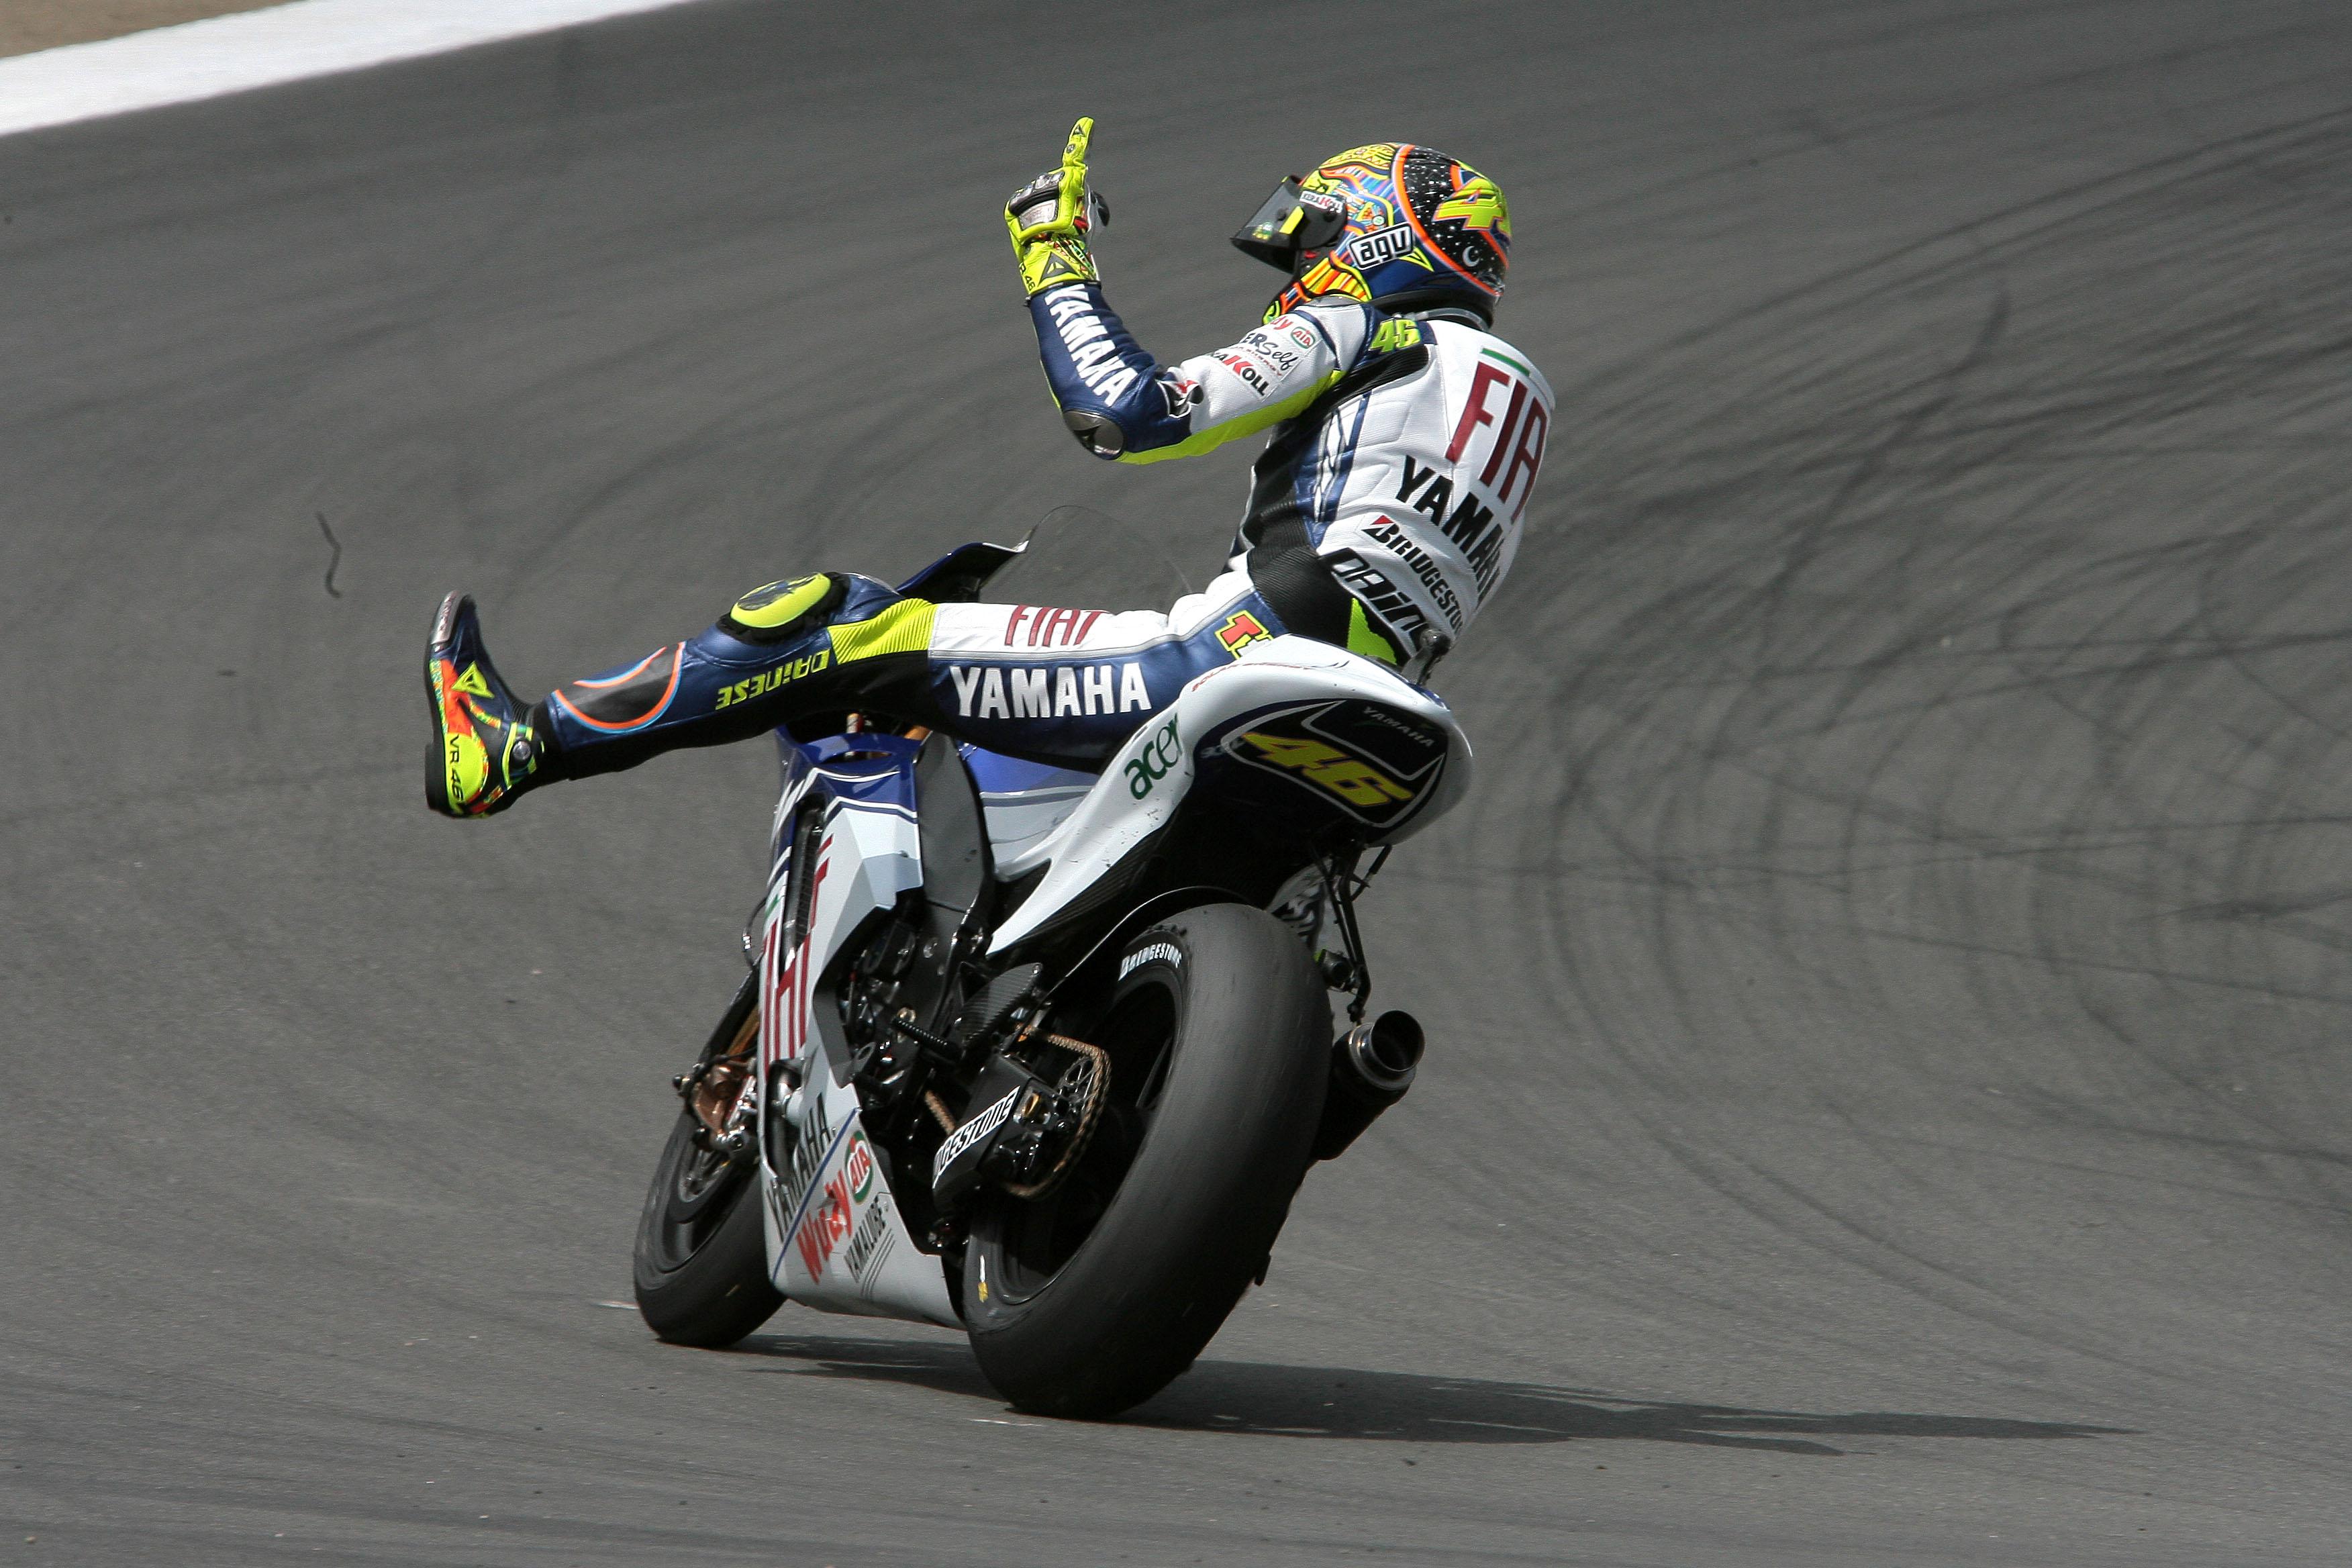 Valentino Rossi Yamaha wins Laguna Seca MotoGP 2008